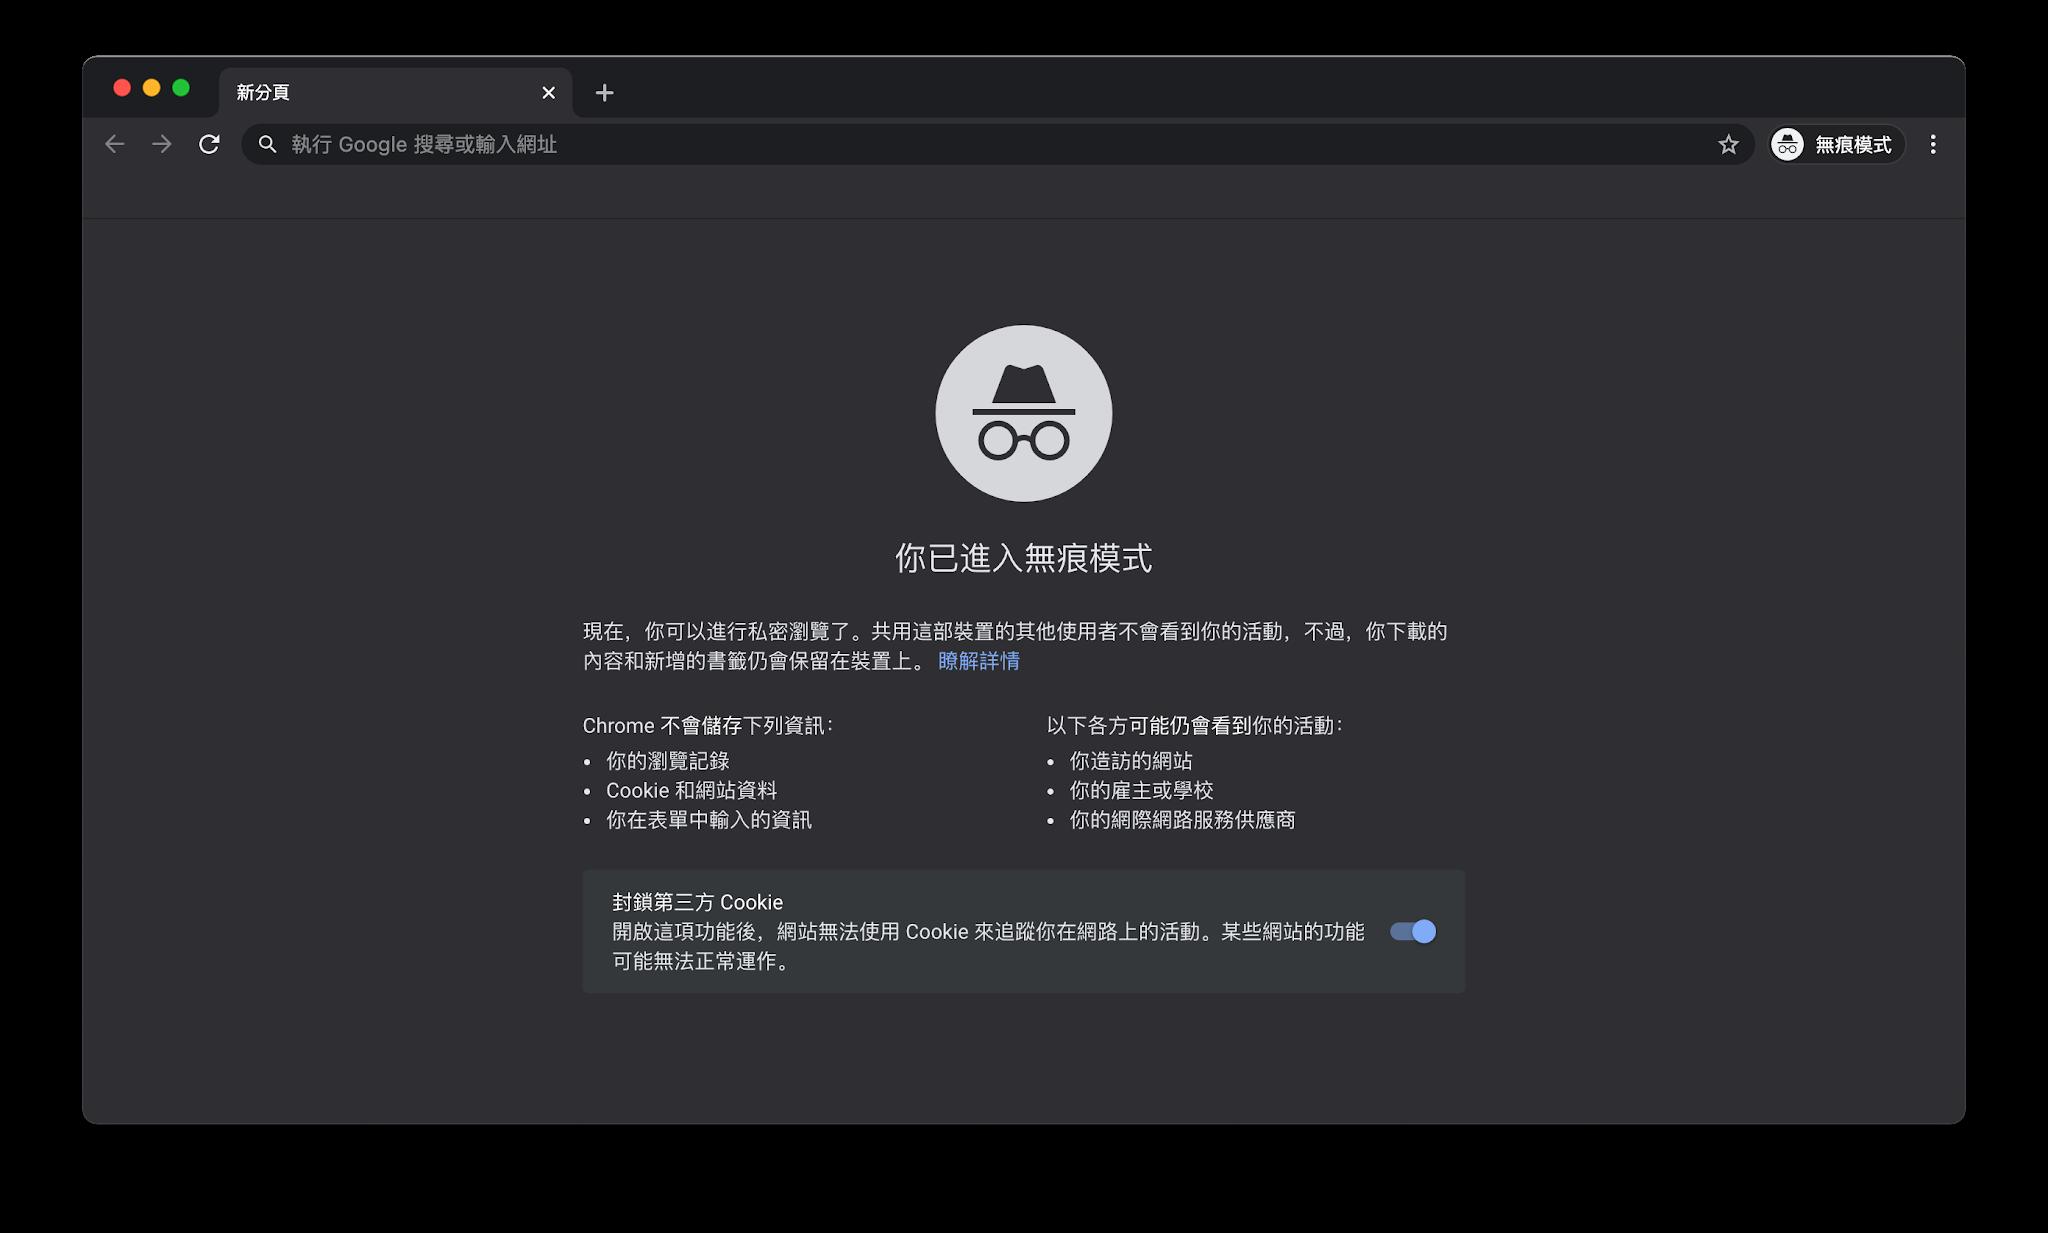 Chrome 無限模式